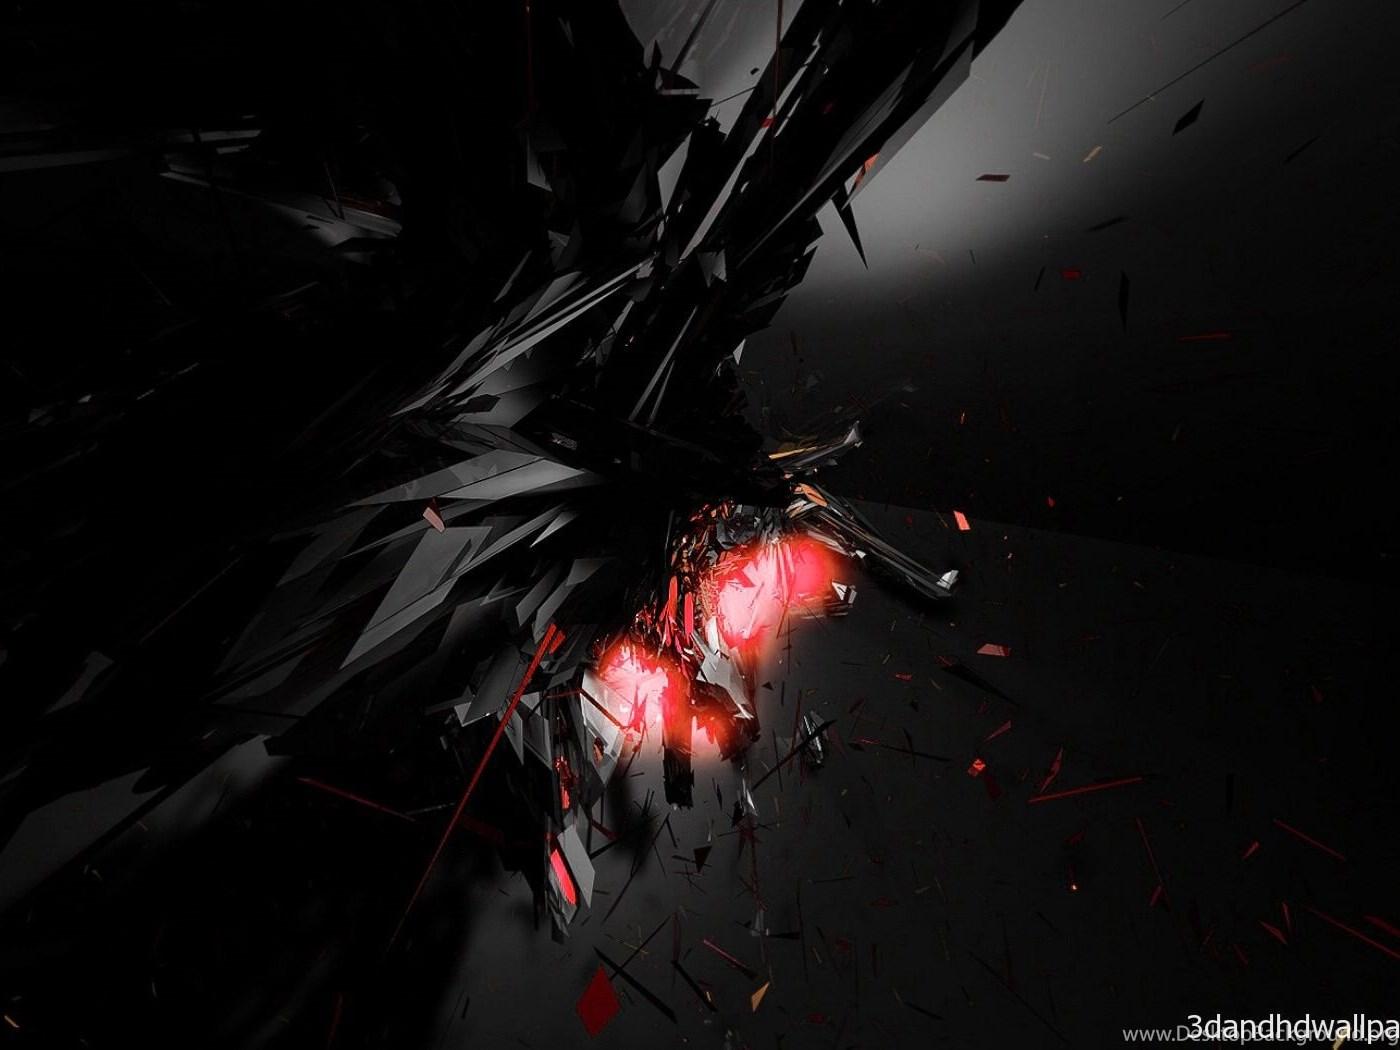 Black Backgrounds Red Fire Hd Wallpapers 3dandhdwallpapers Desktop Background